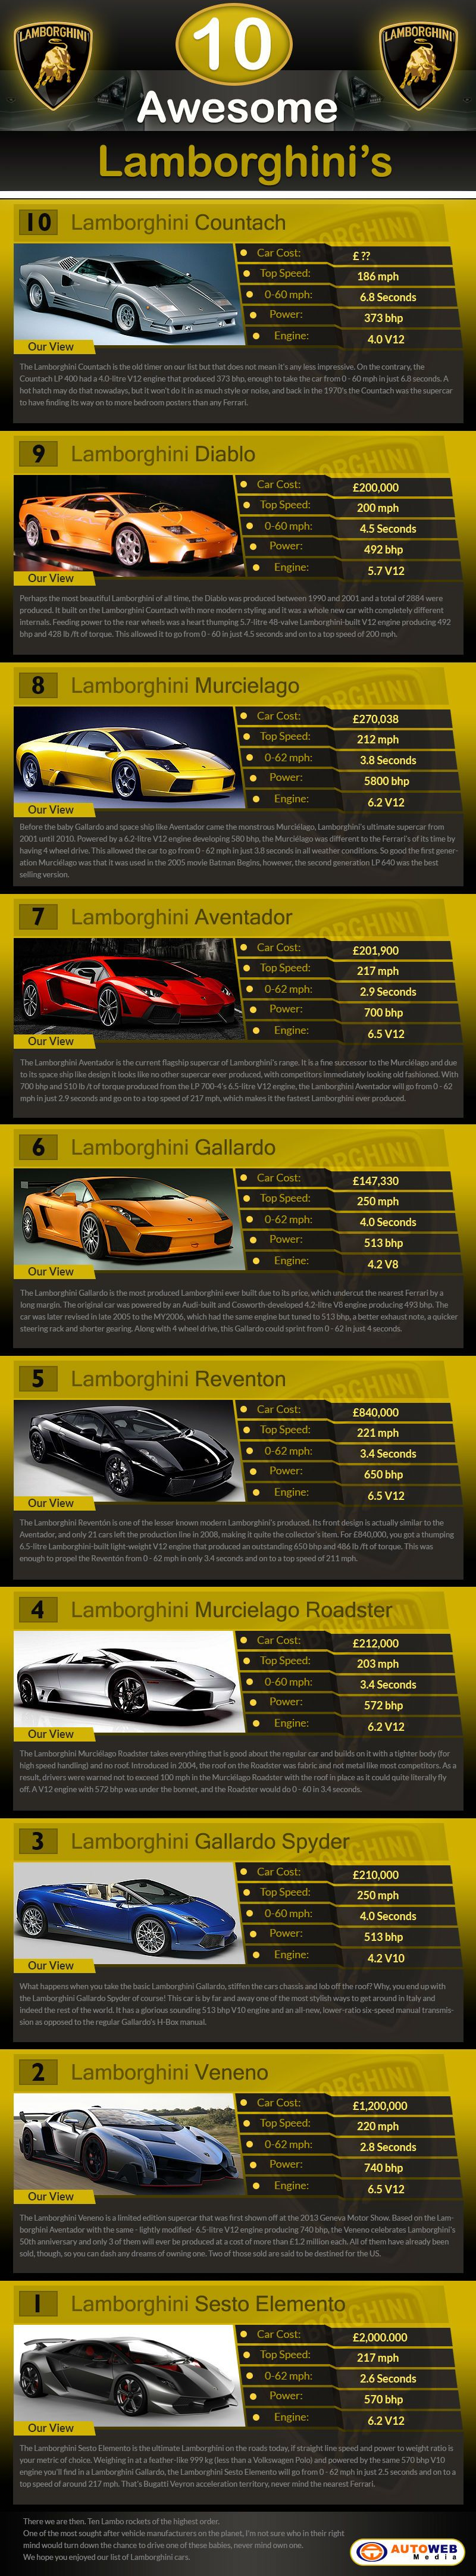 10 Greatest Lamborghini Sports Cars of All Time | BrandonGaille.com | #sweetride #Lamborghini